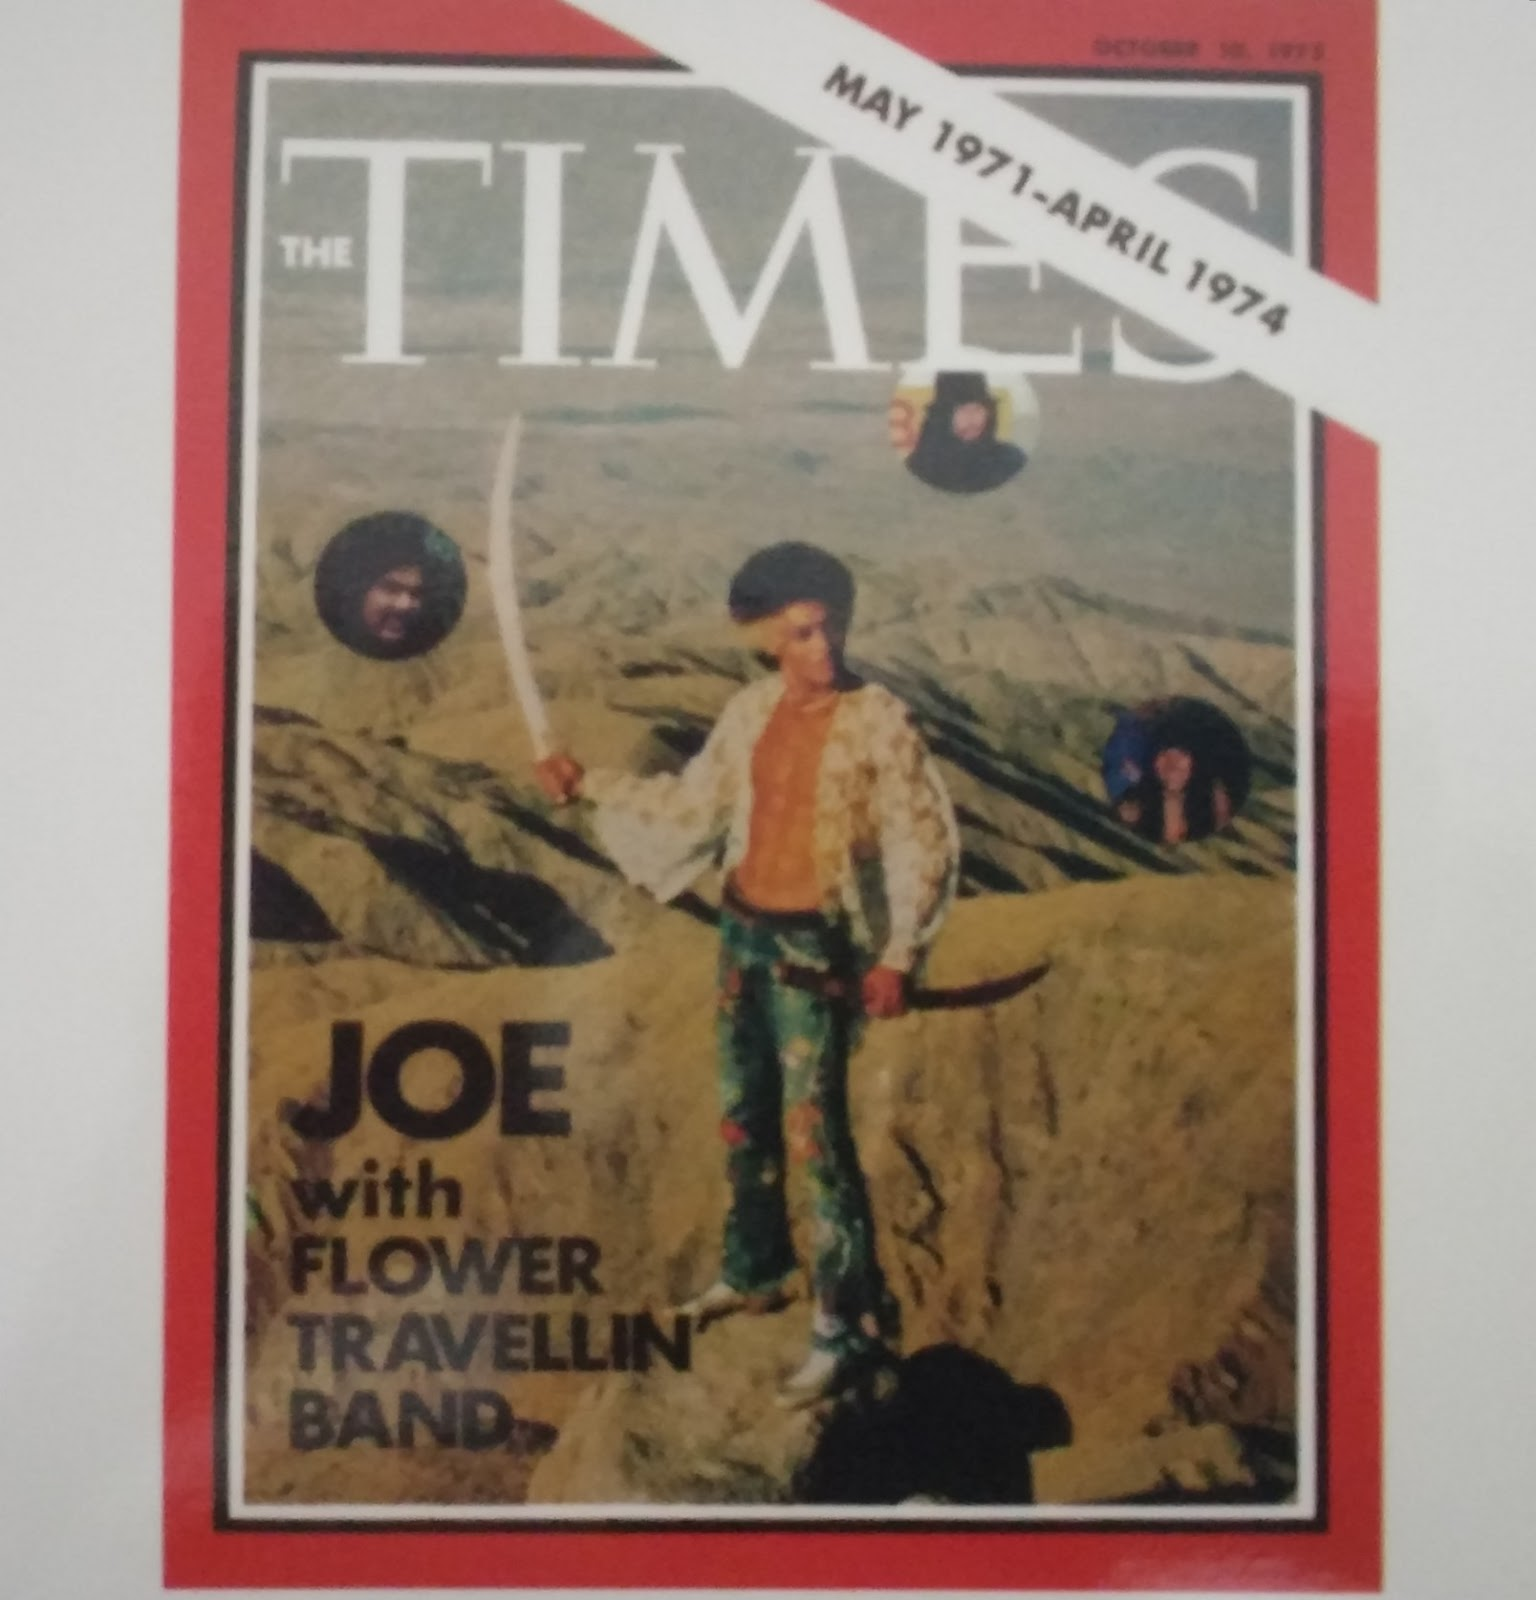 Joe Yamanaka - Joe '70's